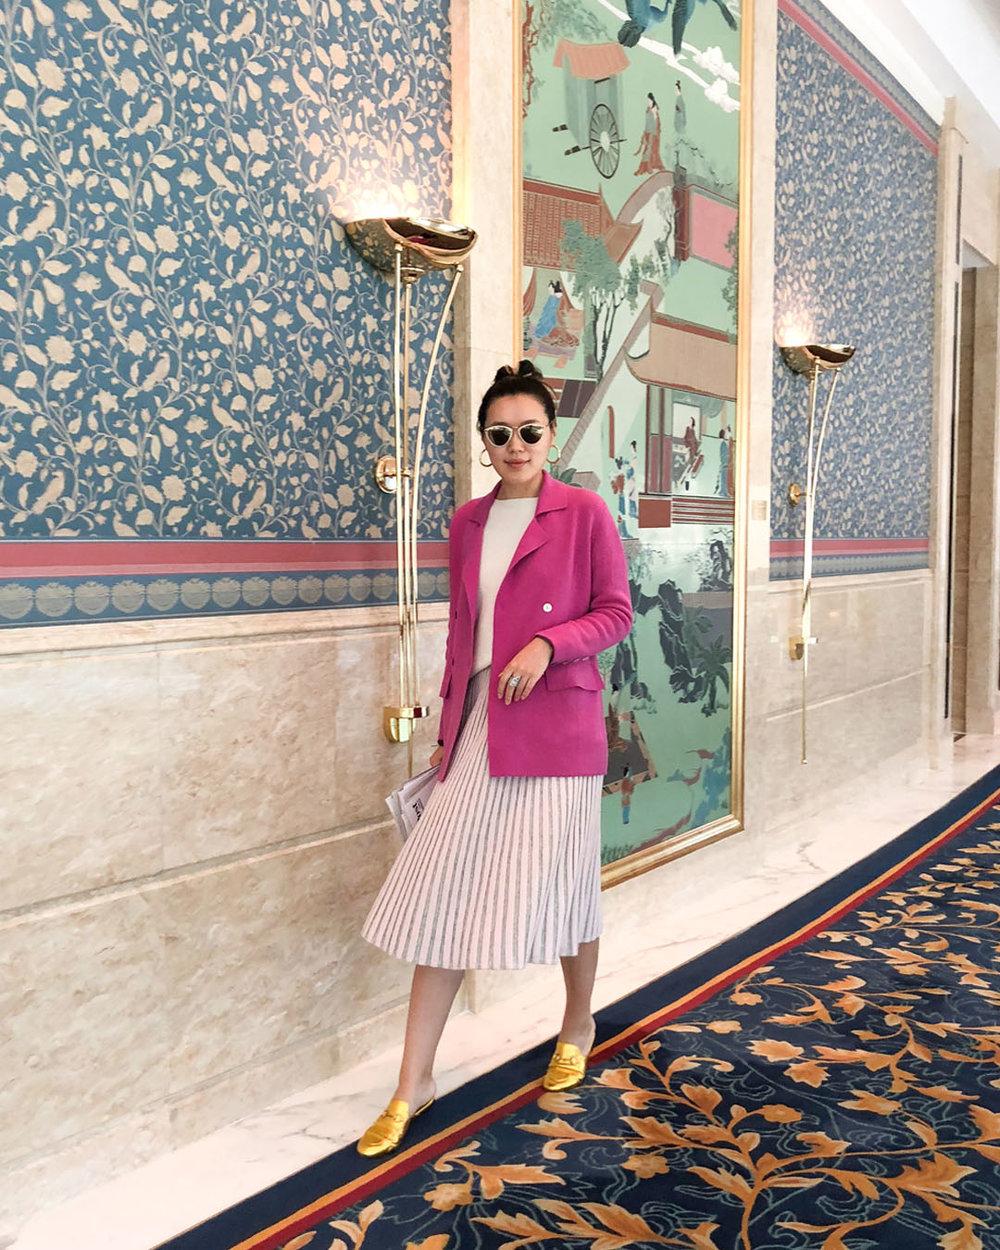 Designer Mandkhai wearing Mandkhai suit blazer and skirt